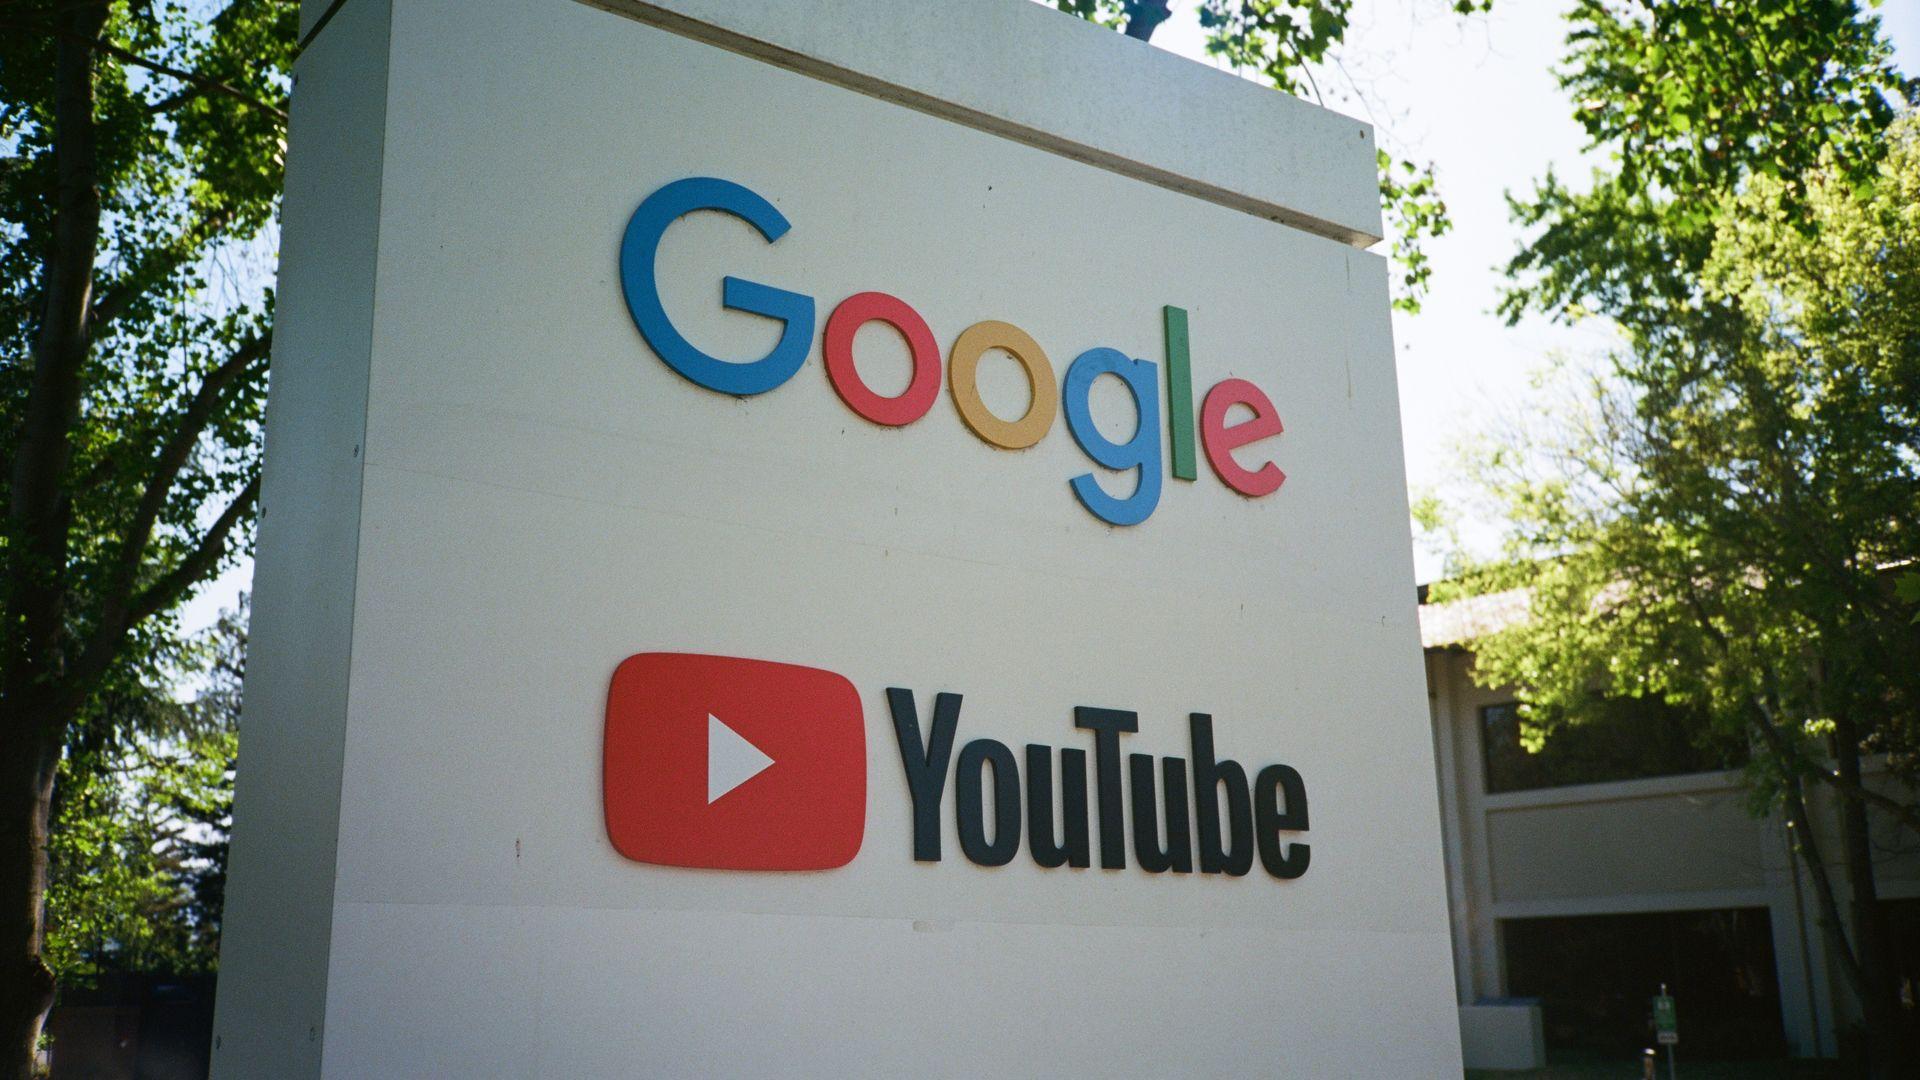 Google Youtube sign